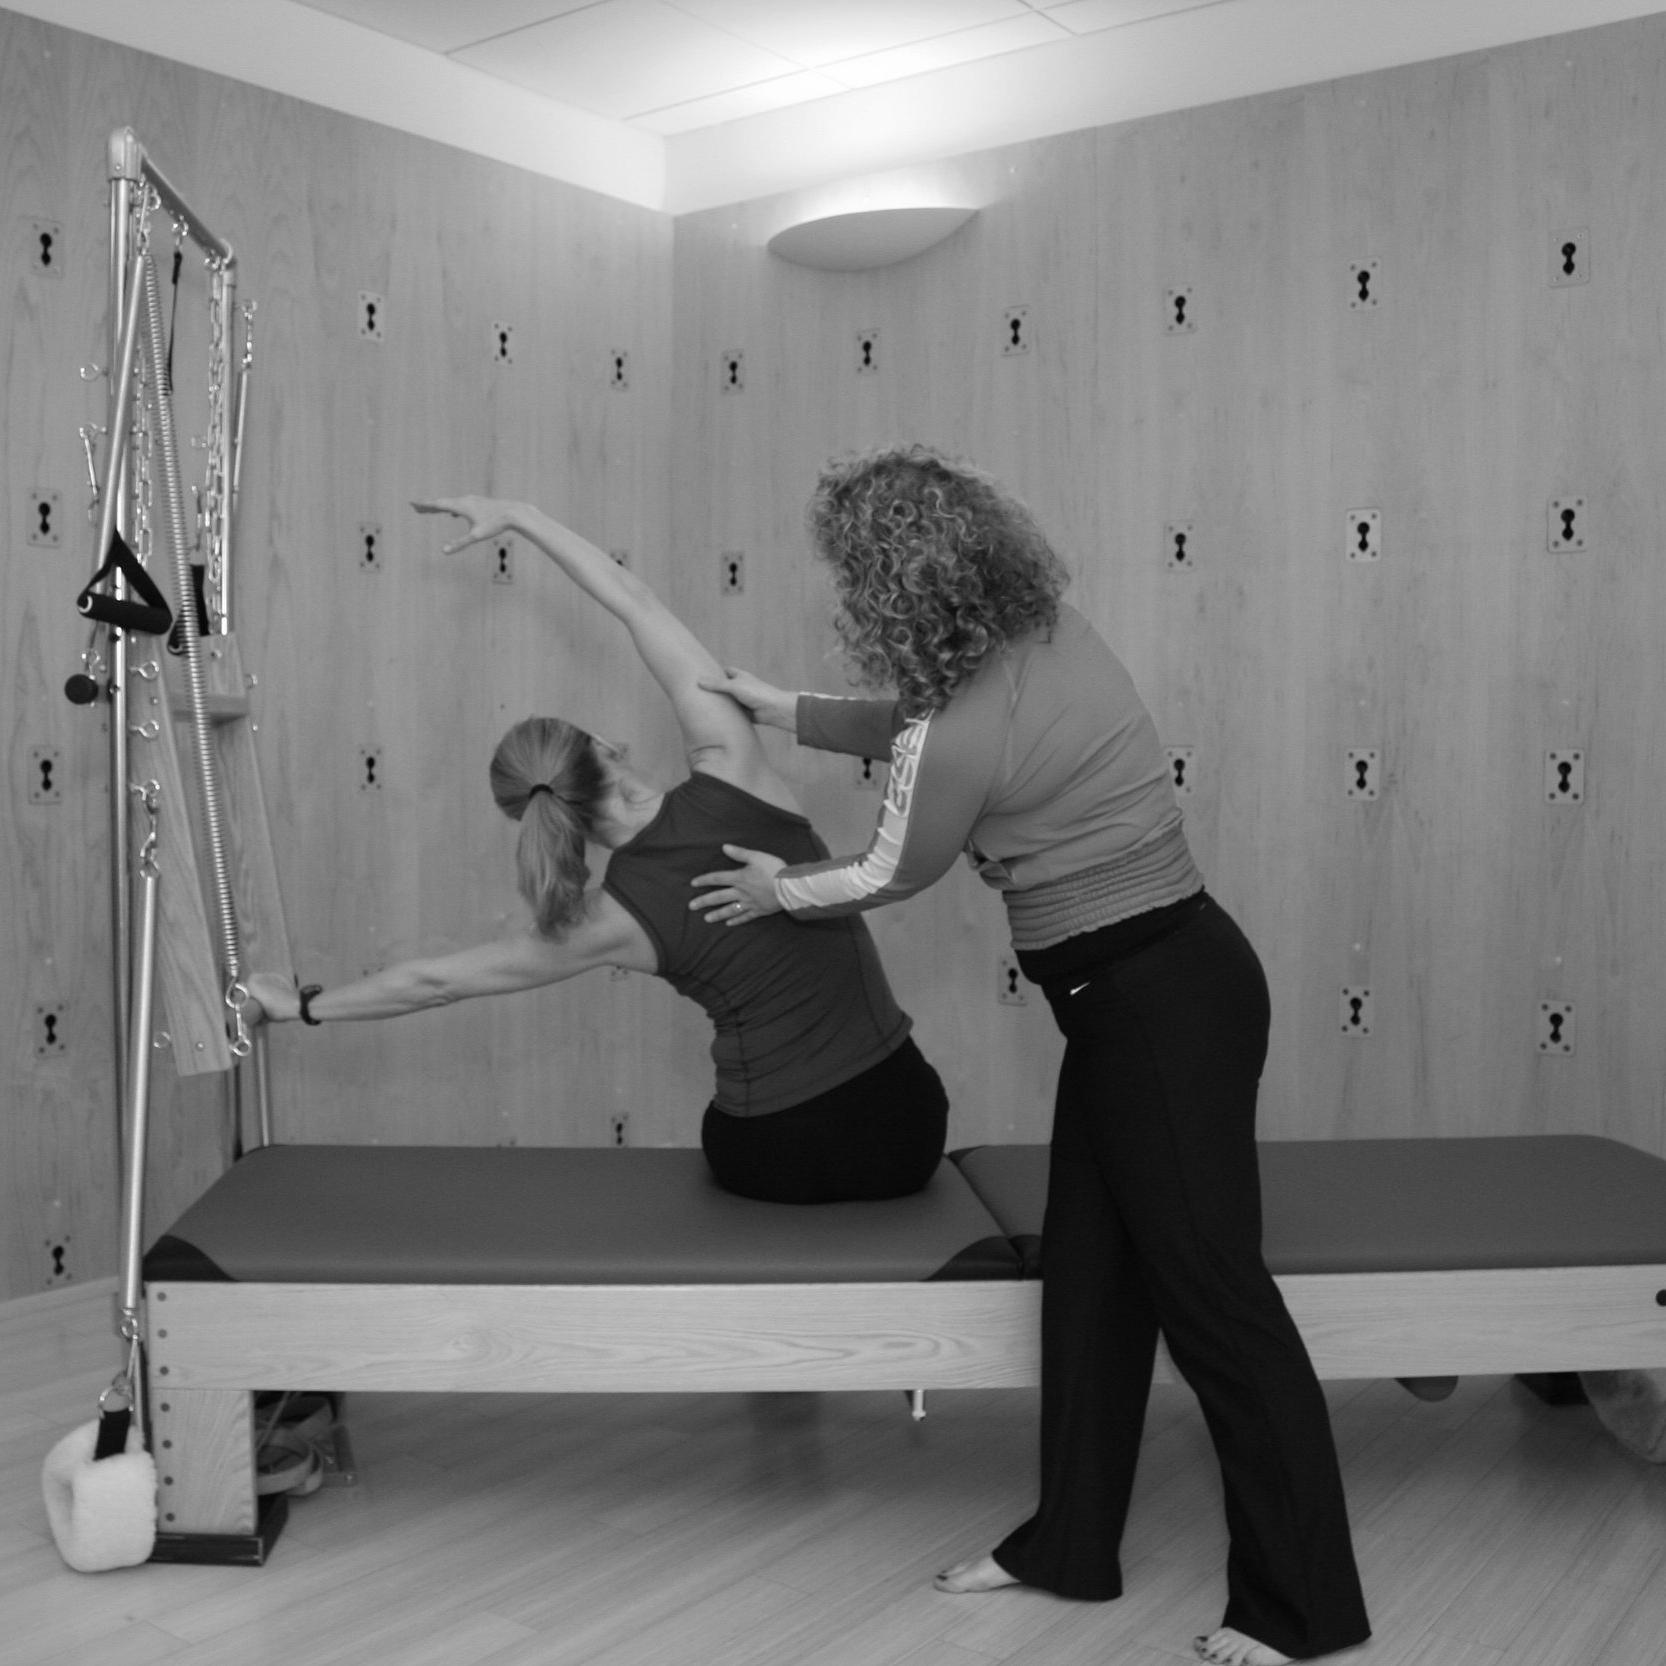 pilates-studio-austin-tx